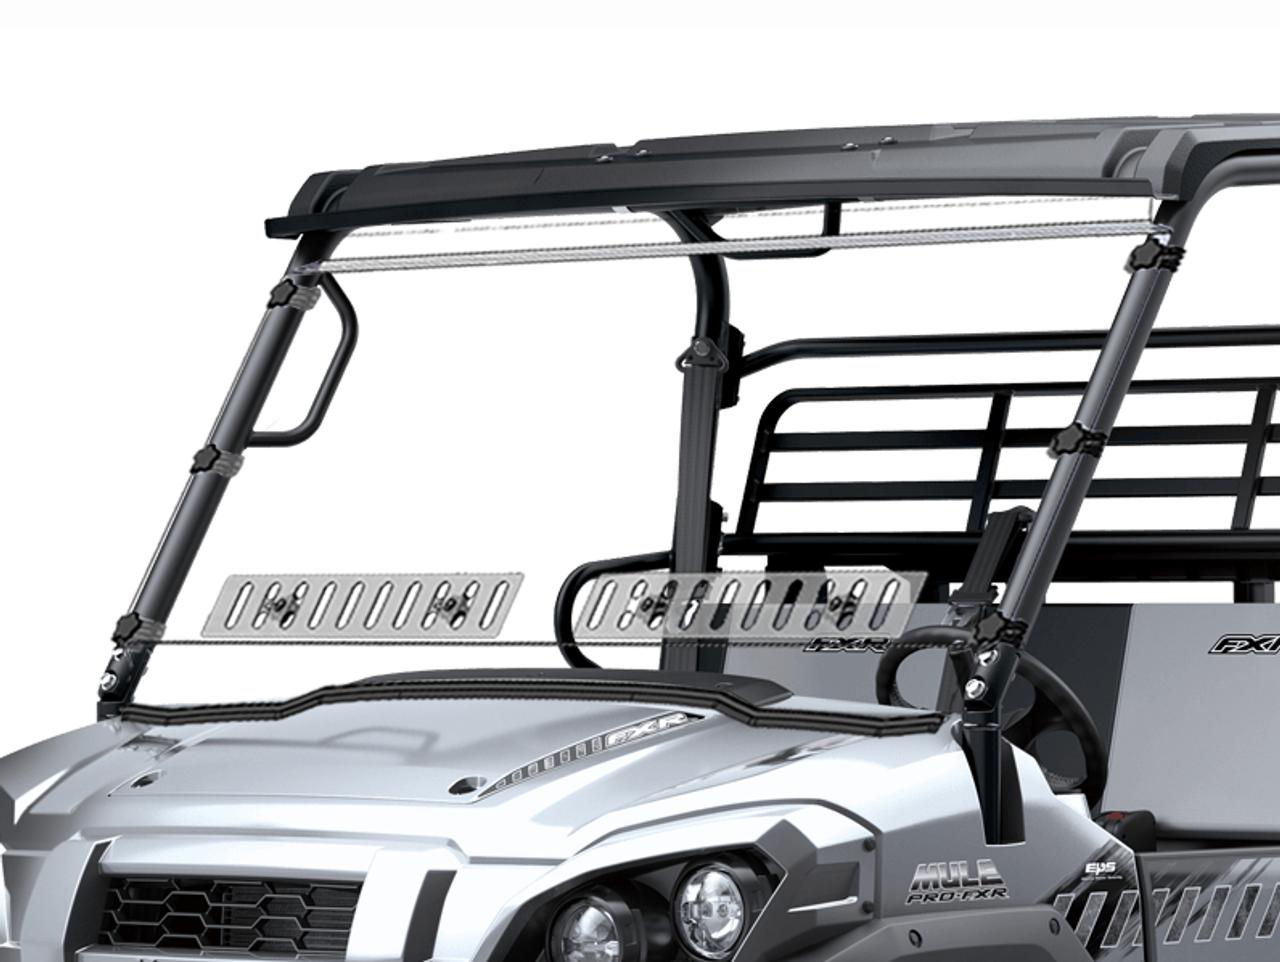 Kawasaki Mule Pro Fxr Dual Vented Windshield Whardcoat